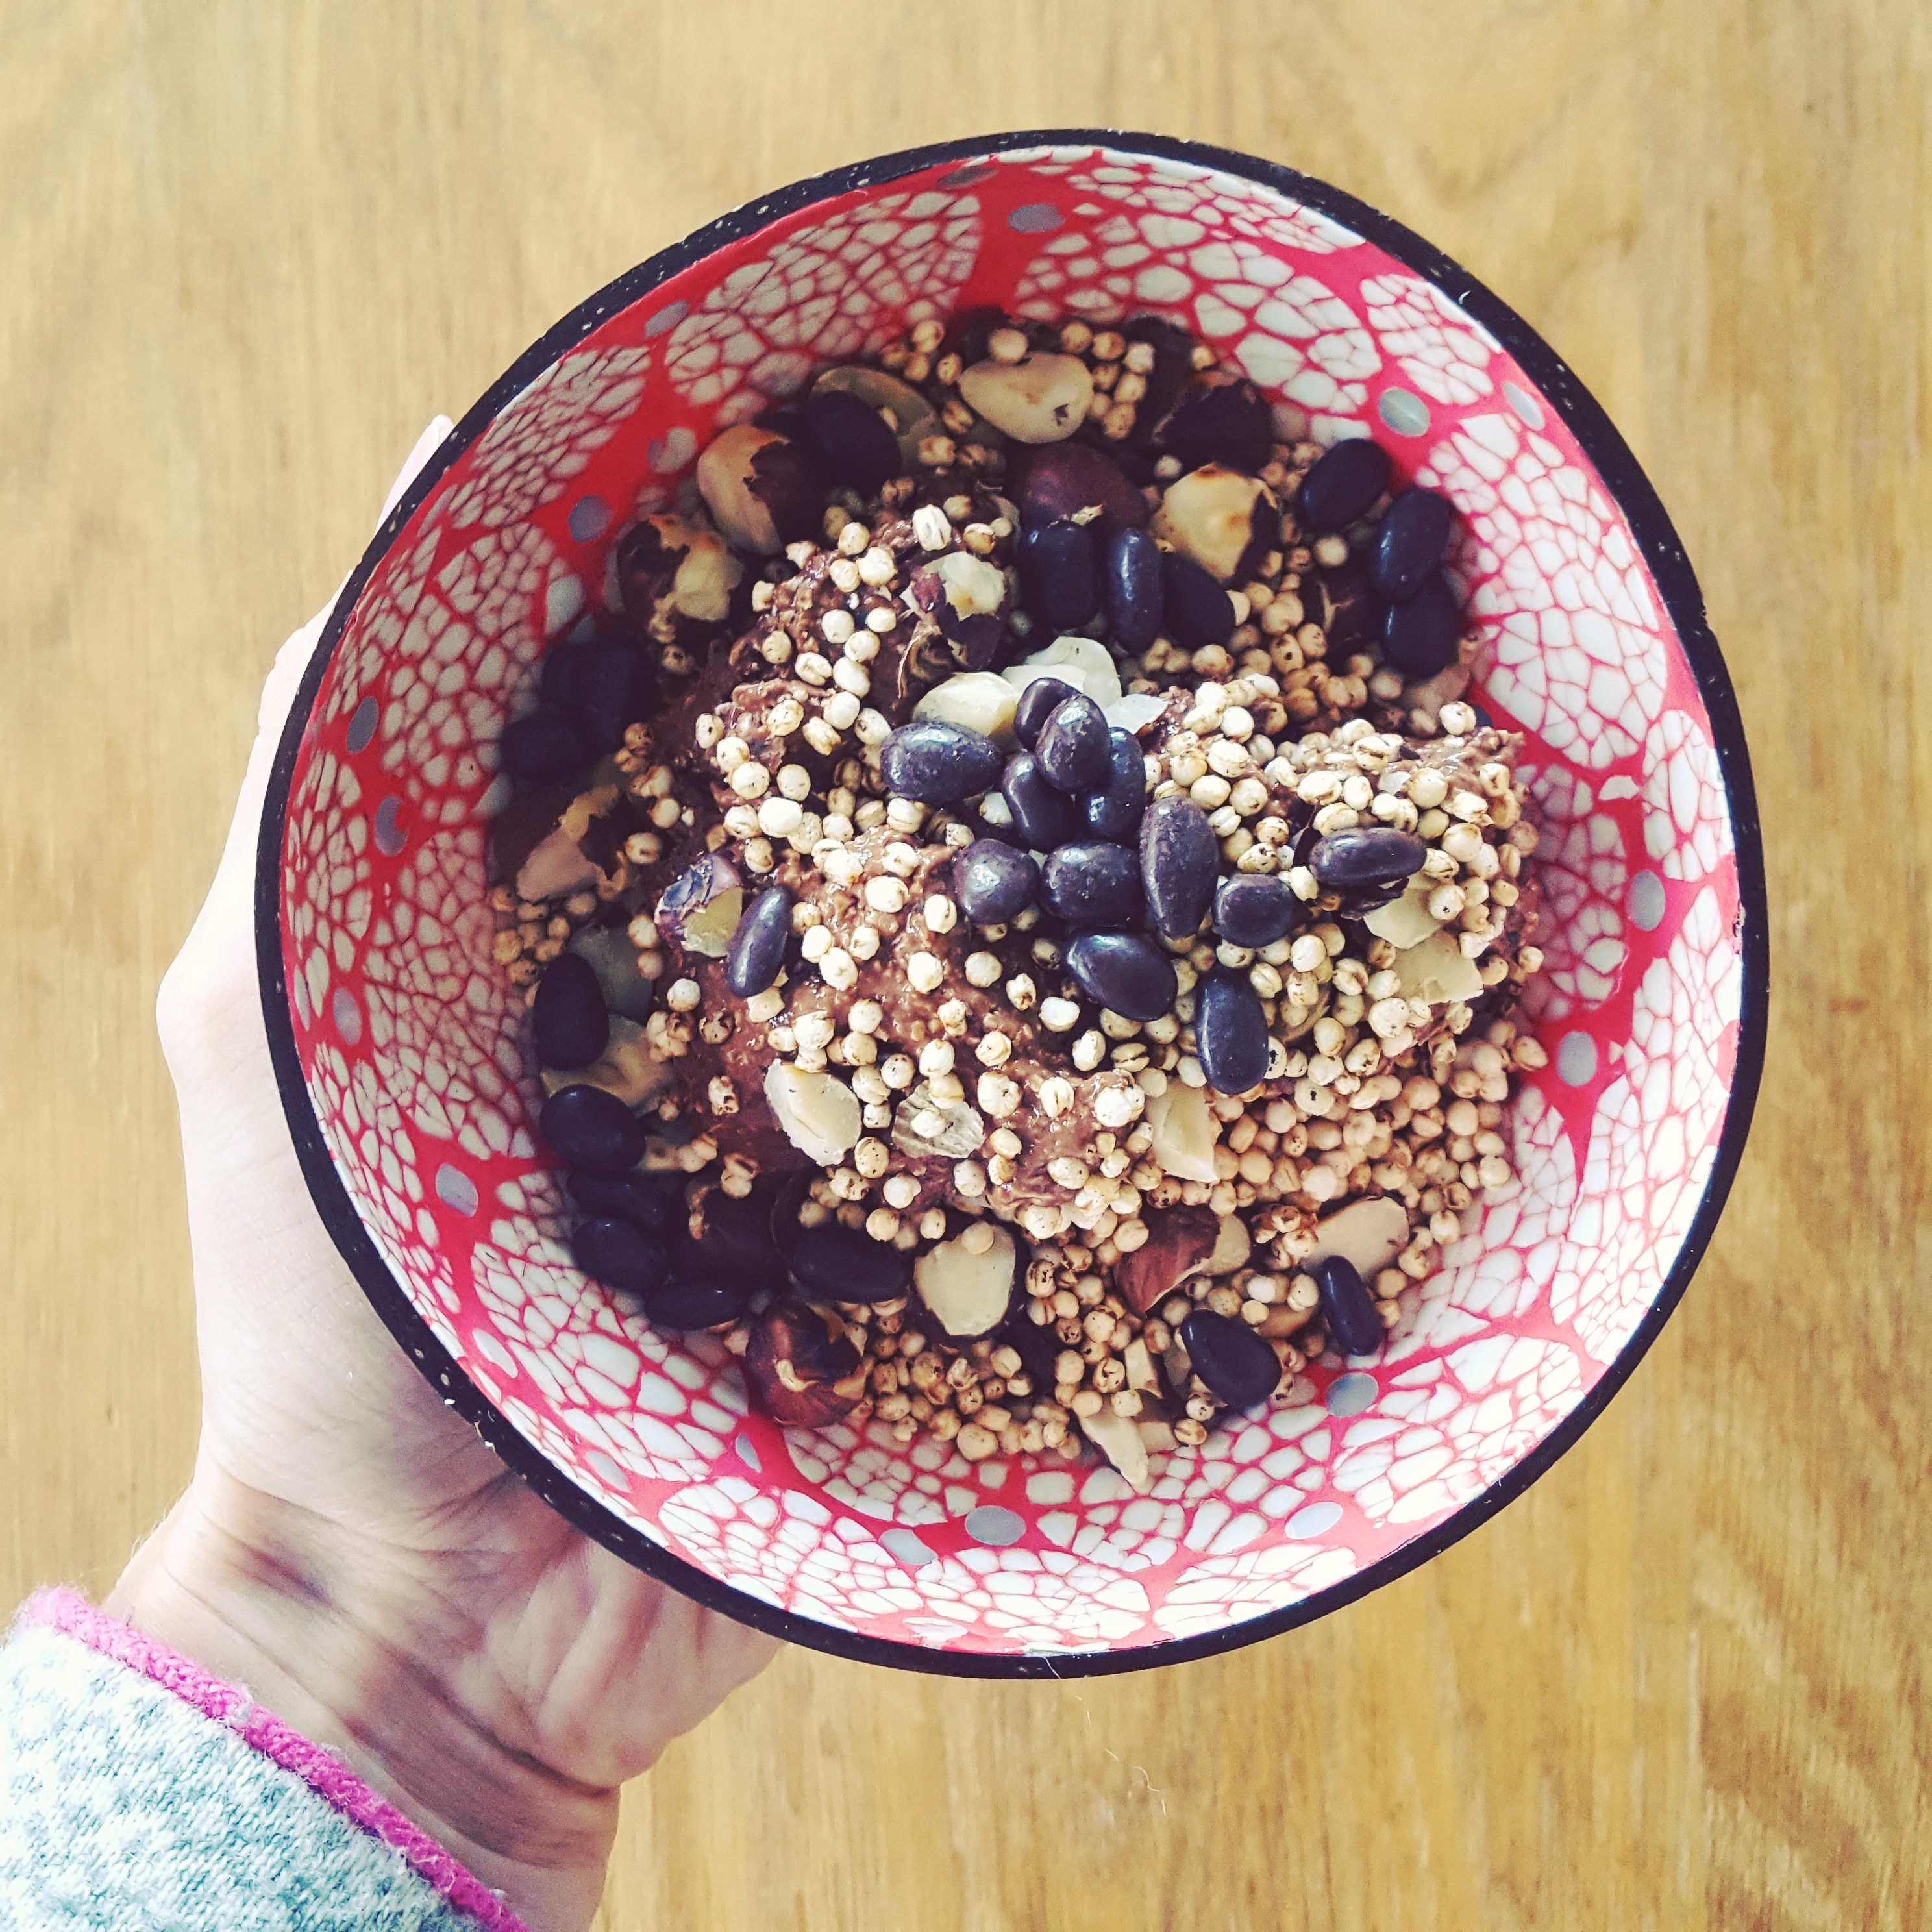 Chocolate lover's breakfast